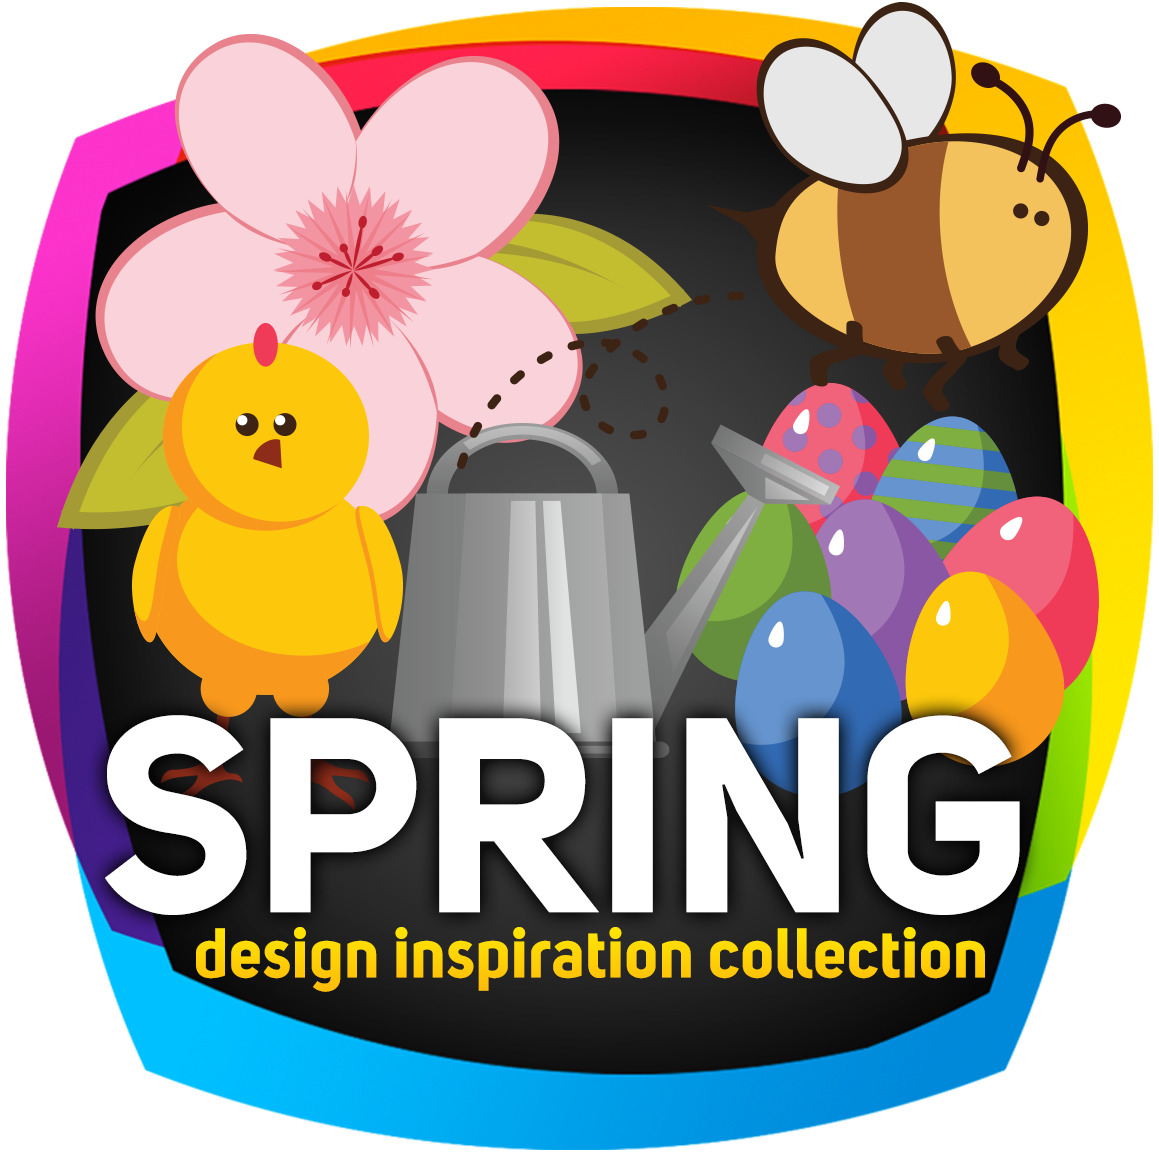 Spring design inspiration collection. Pc clipart designer